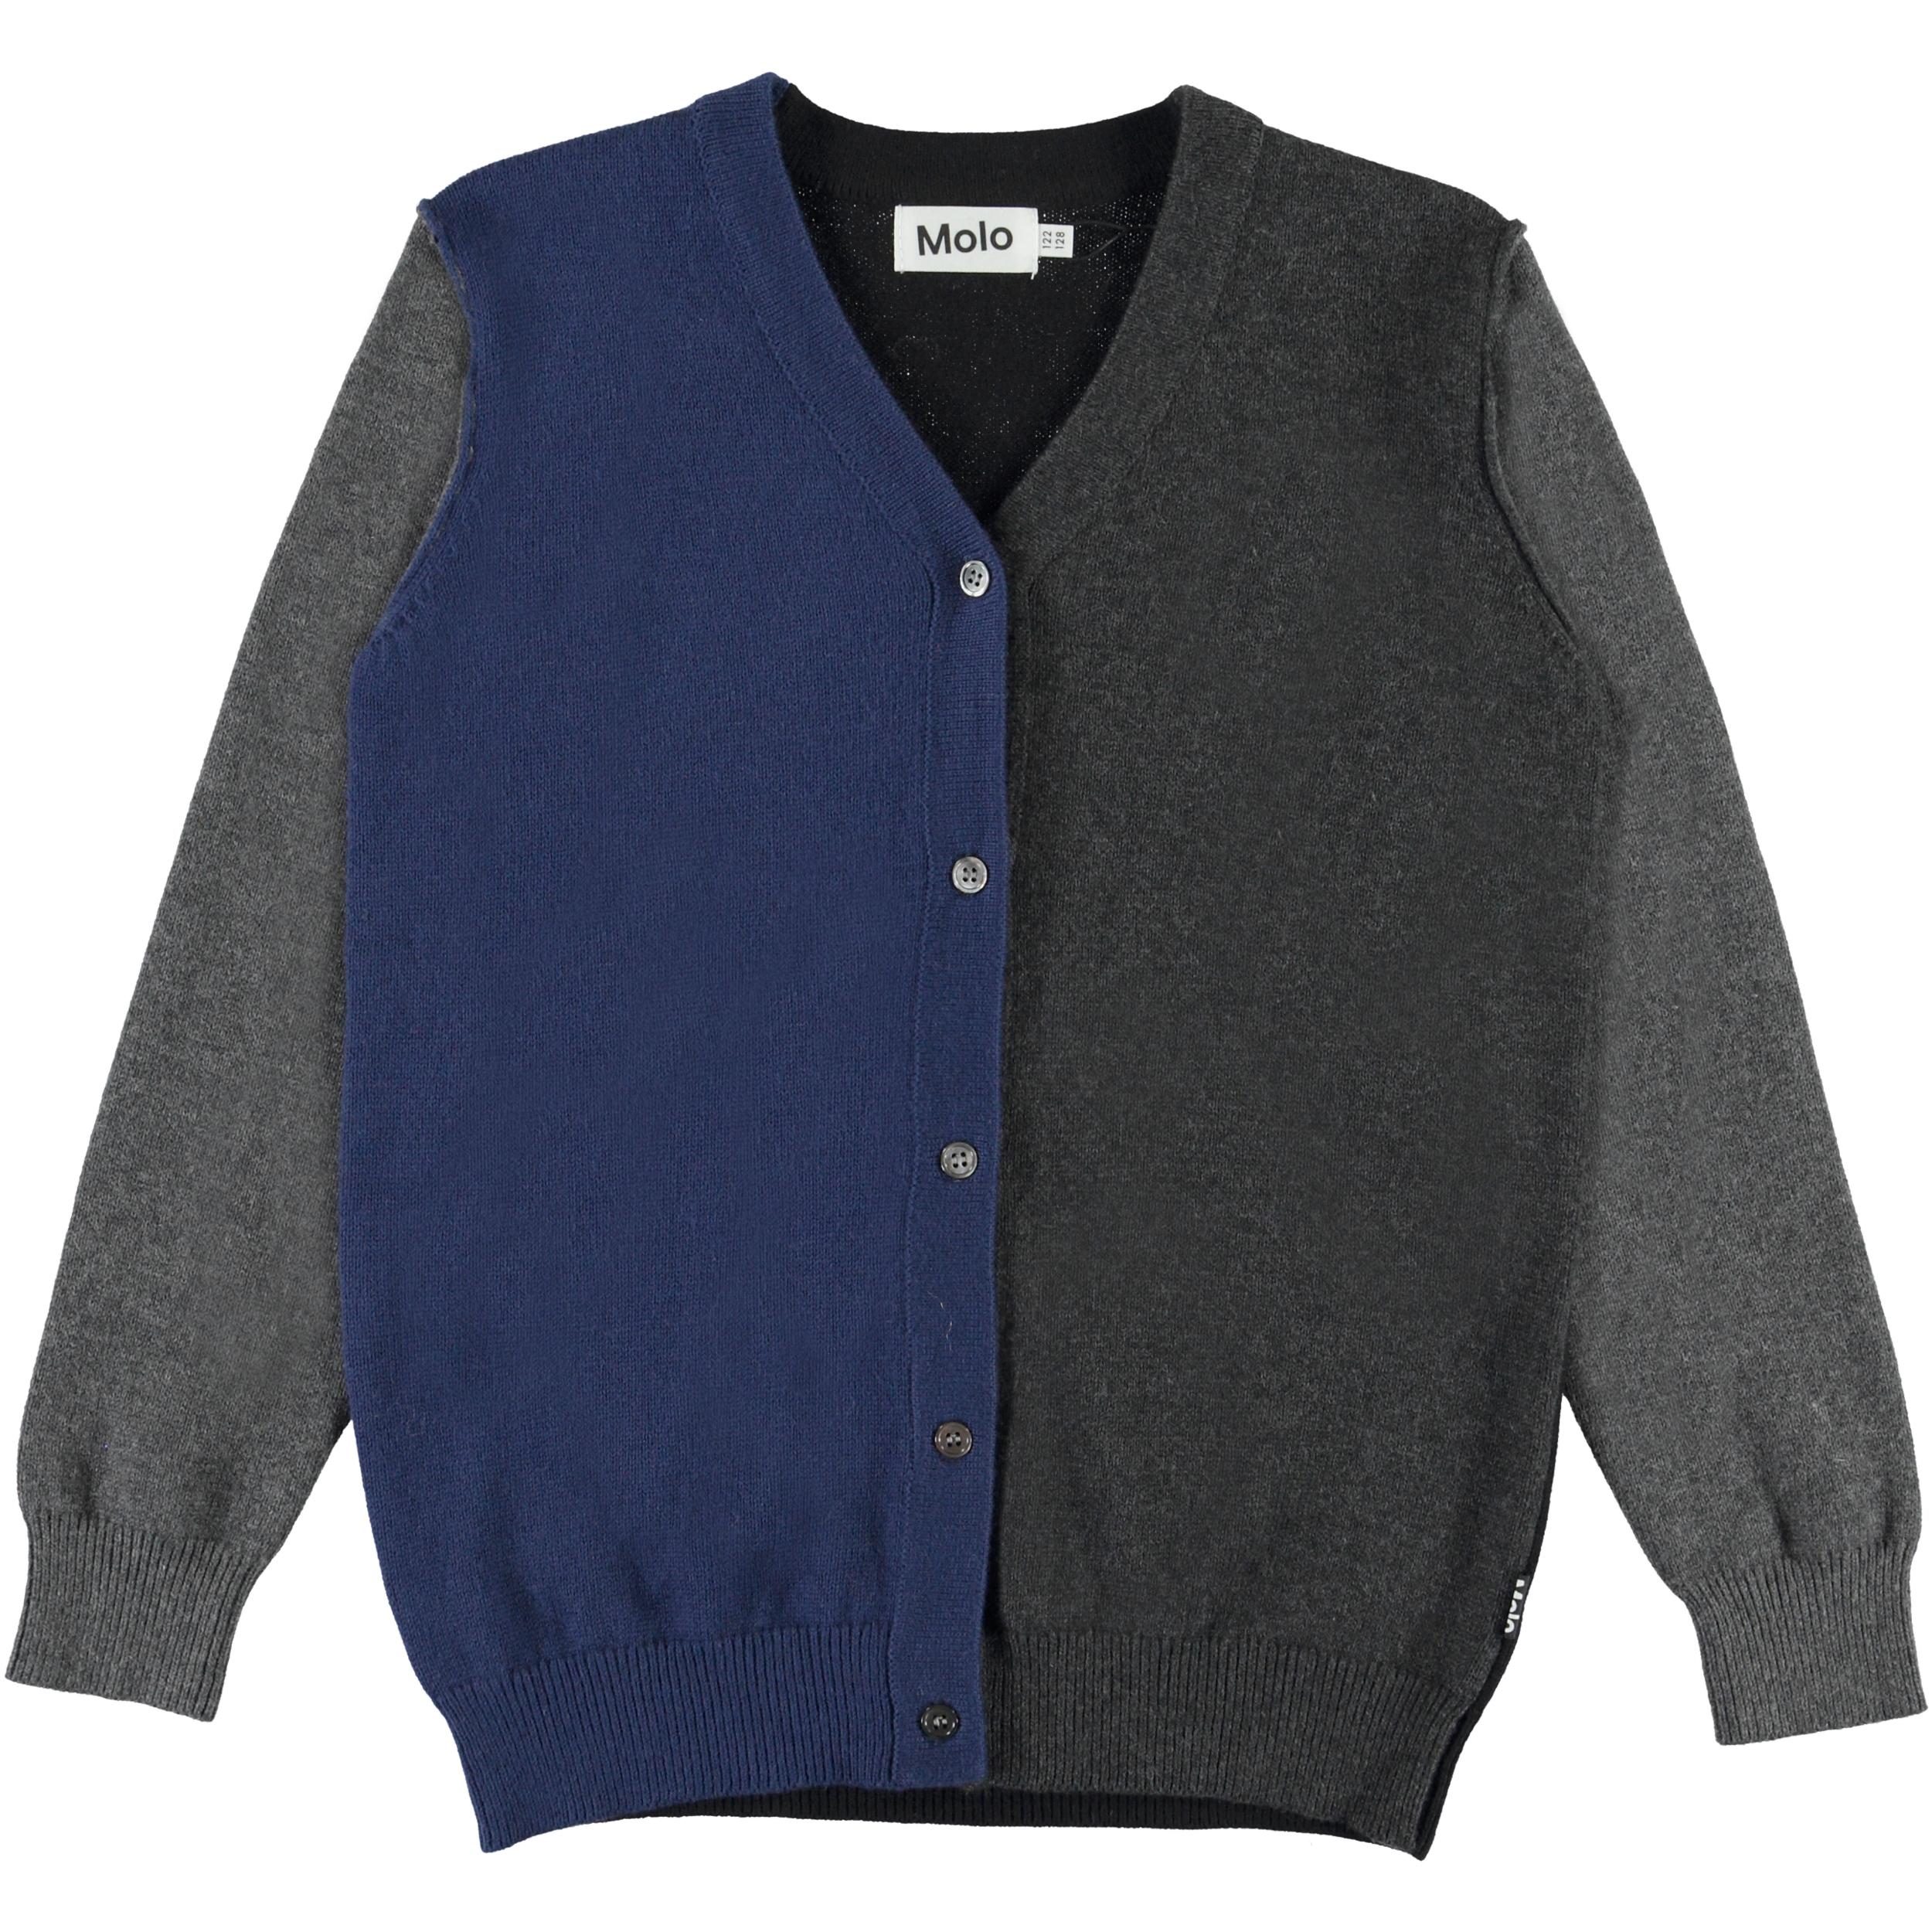 Billy Grey Melange Grijze, fijn gebreide trui van wol Molo